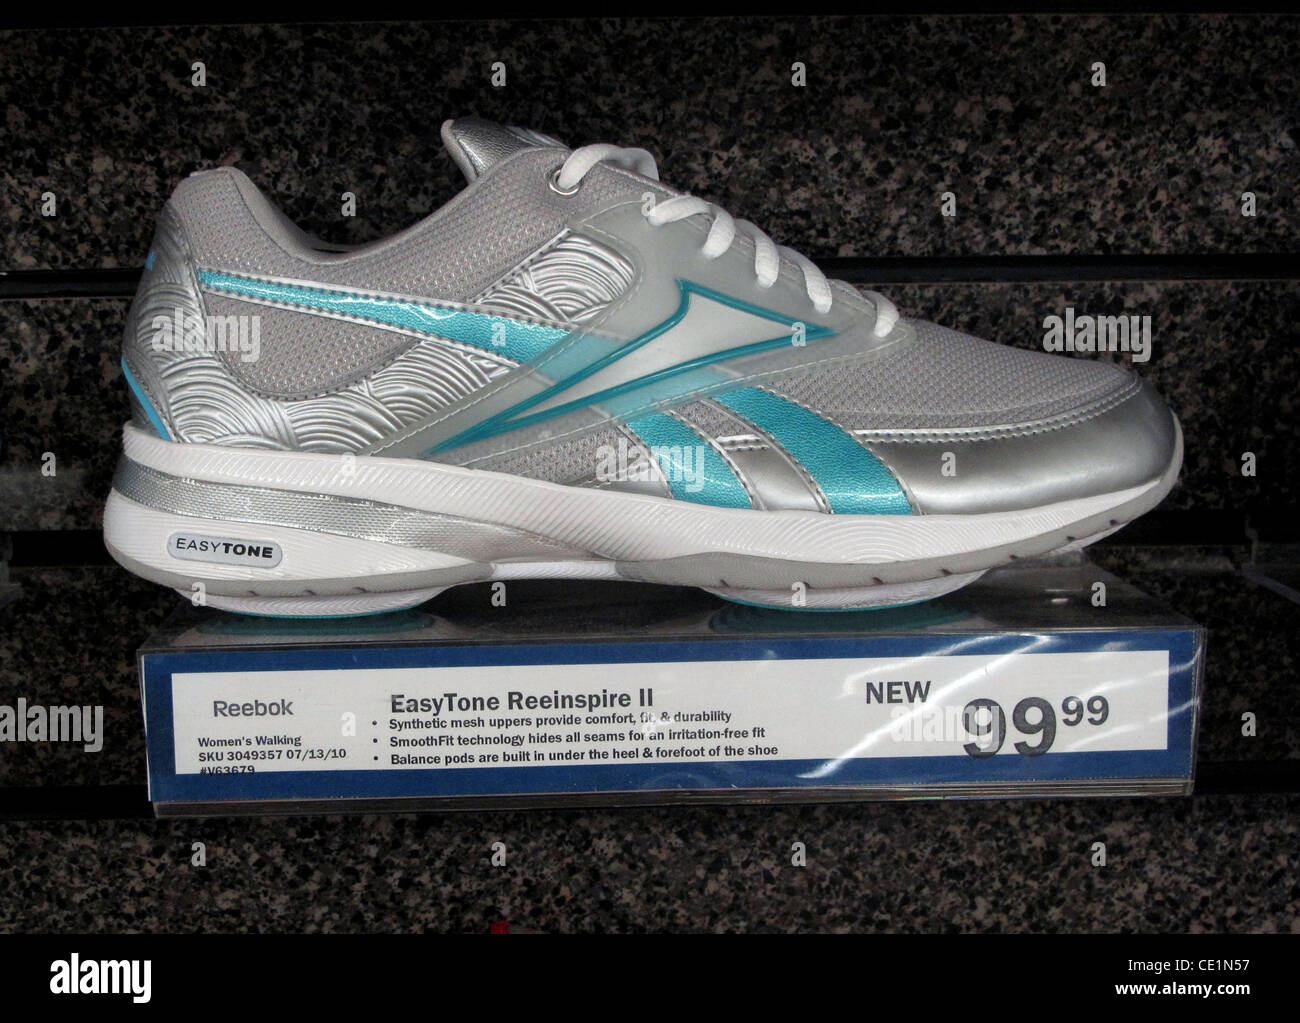 b696c99f92205 reebok shoes 2011